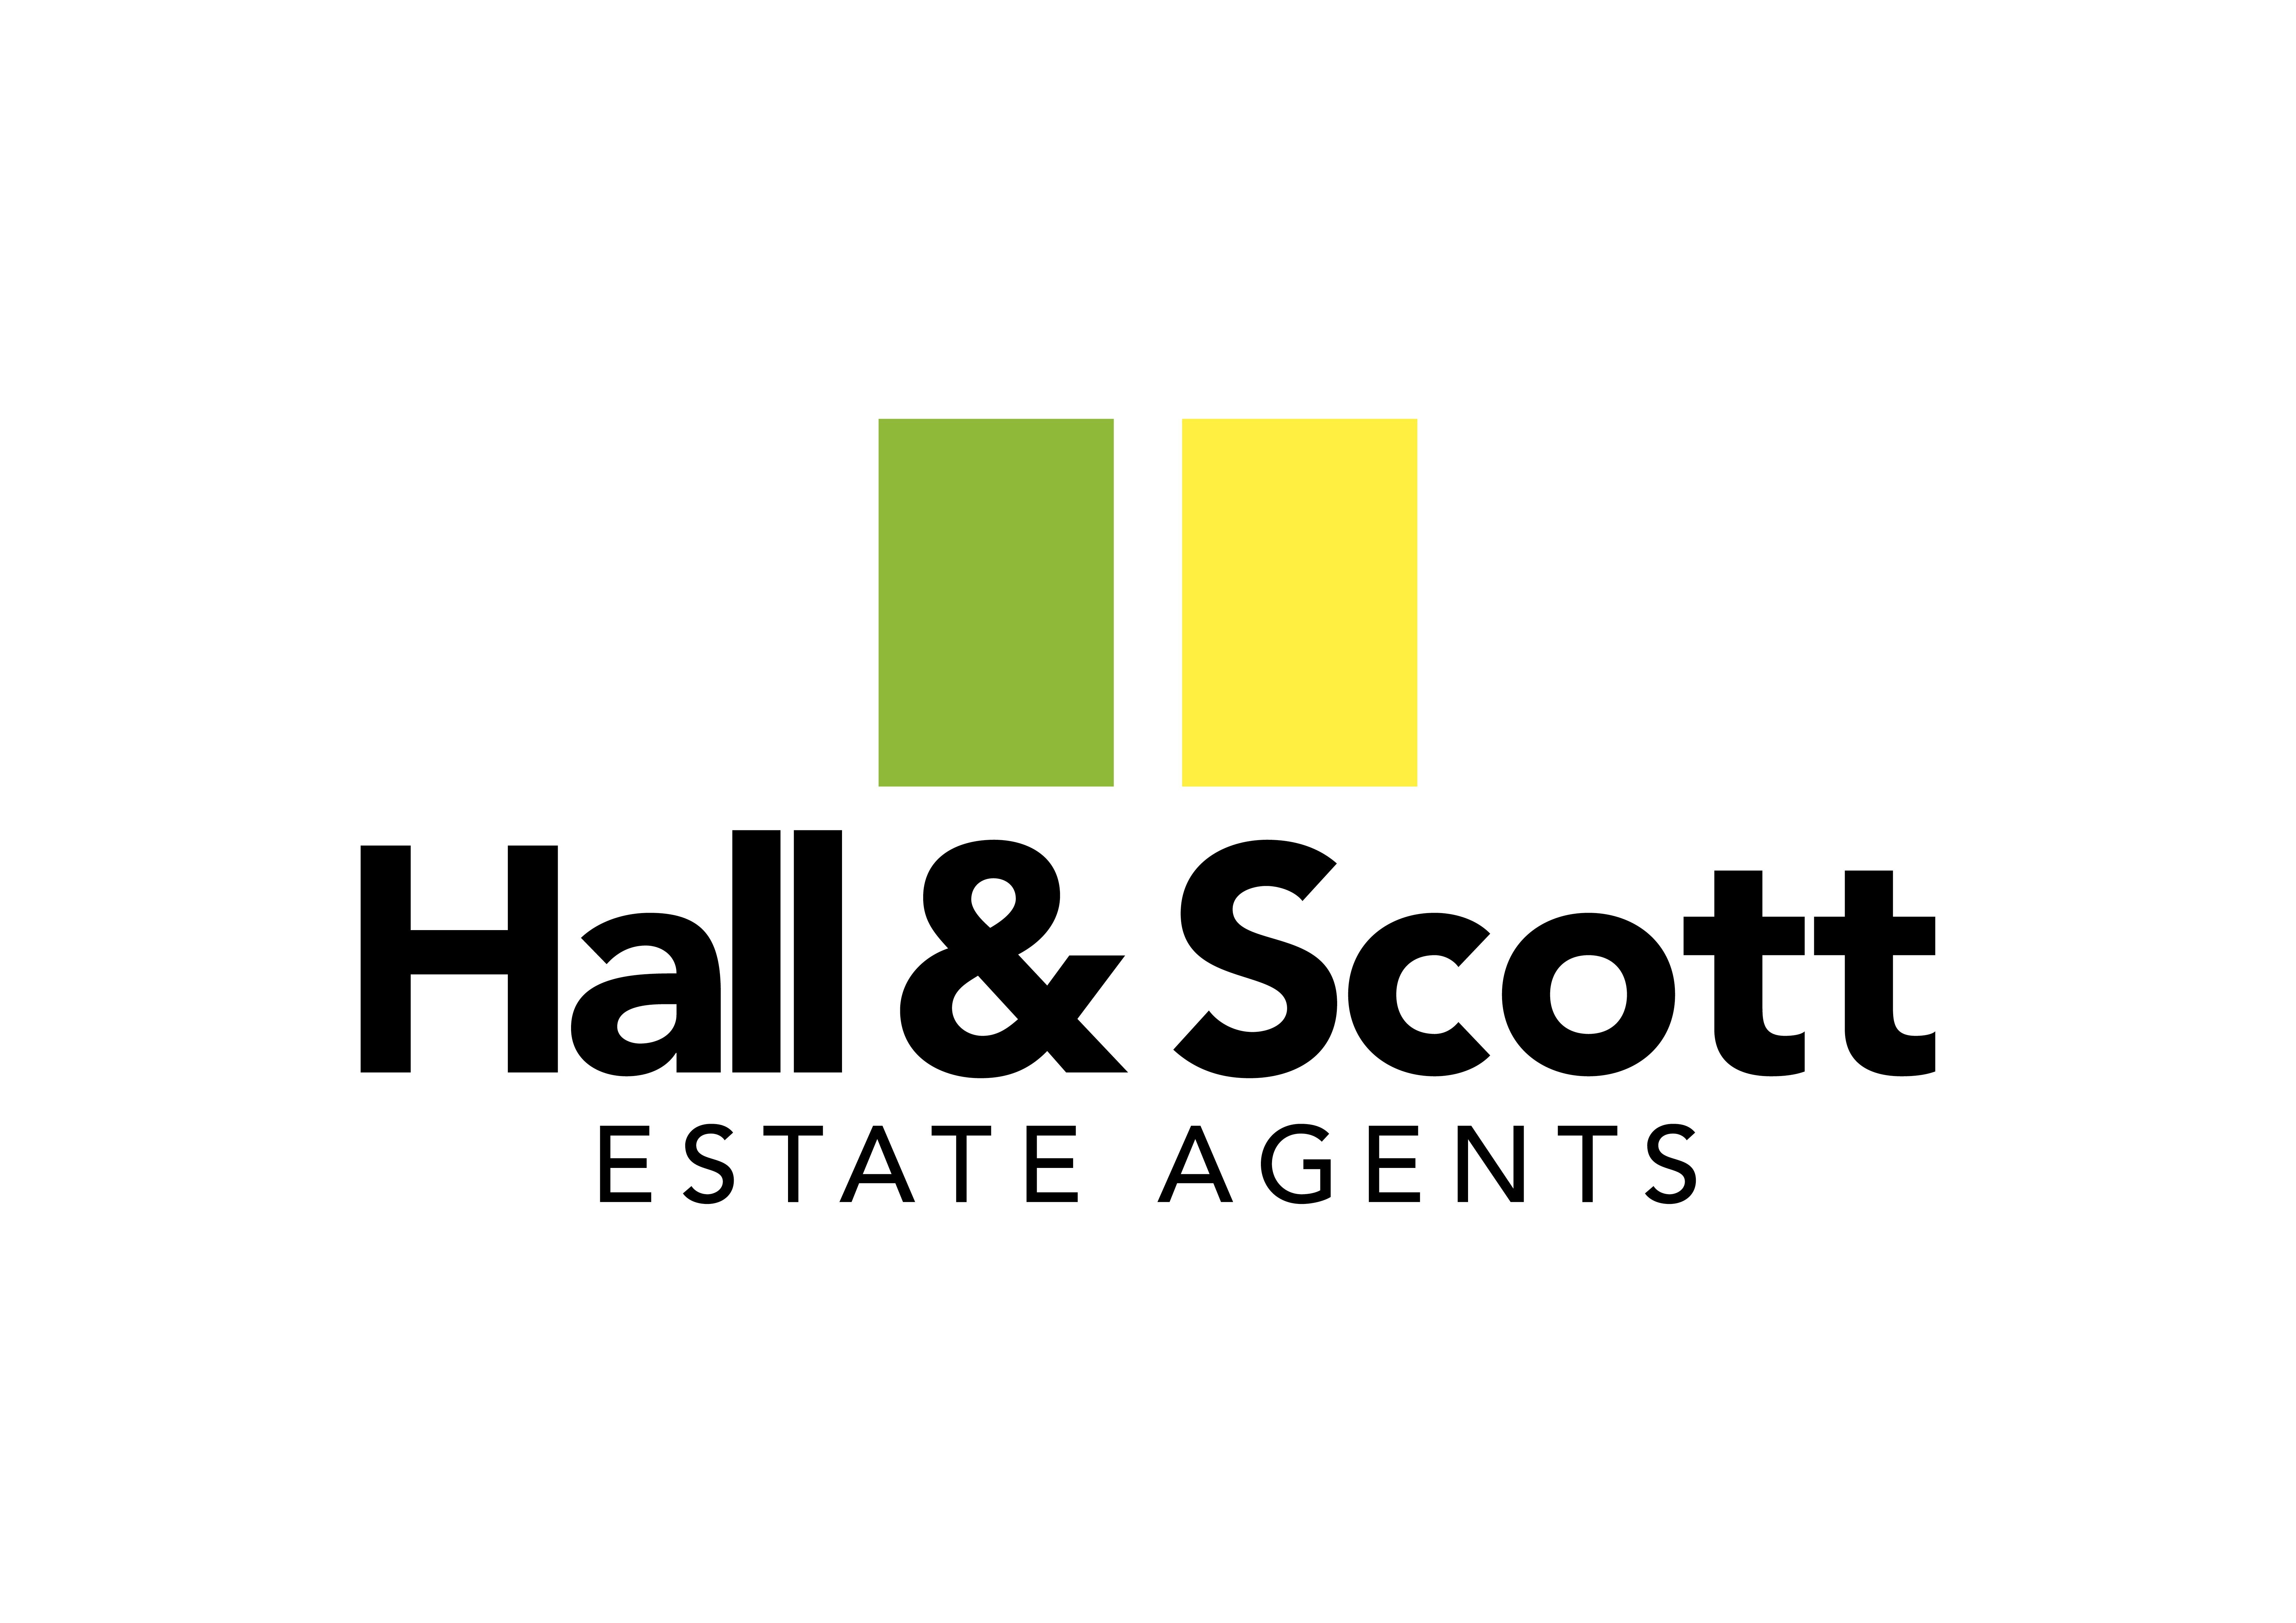 Hall & Scott Estate Agents